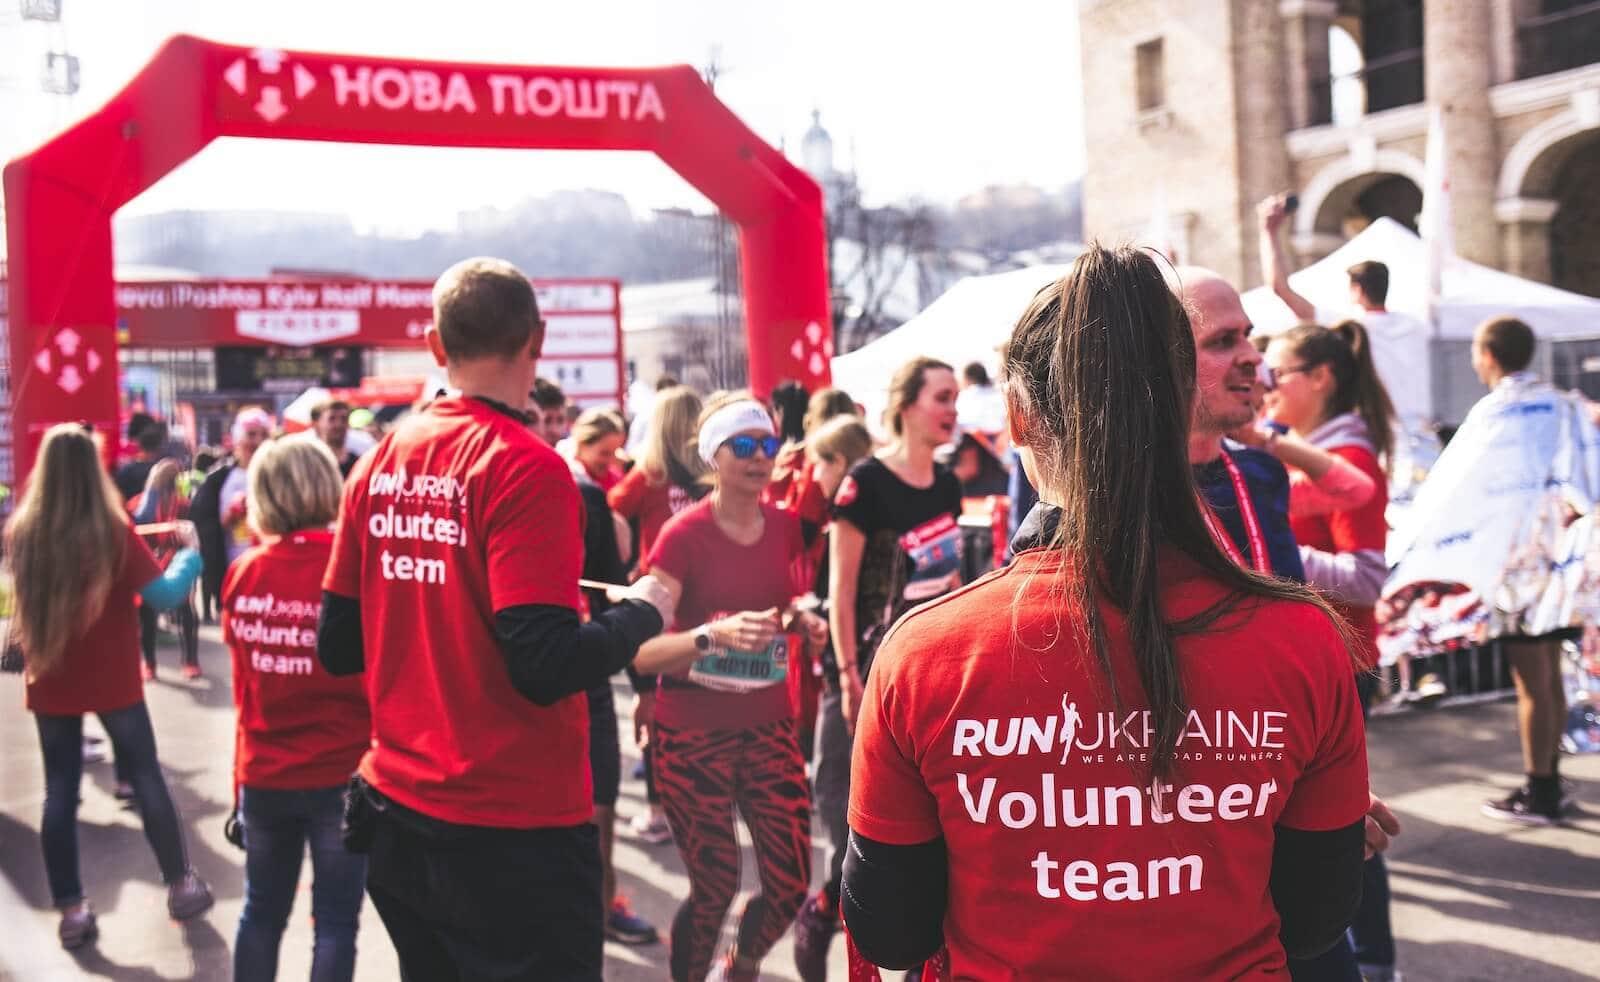 volunteers at a marathon